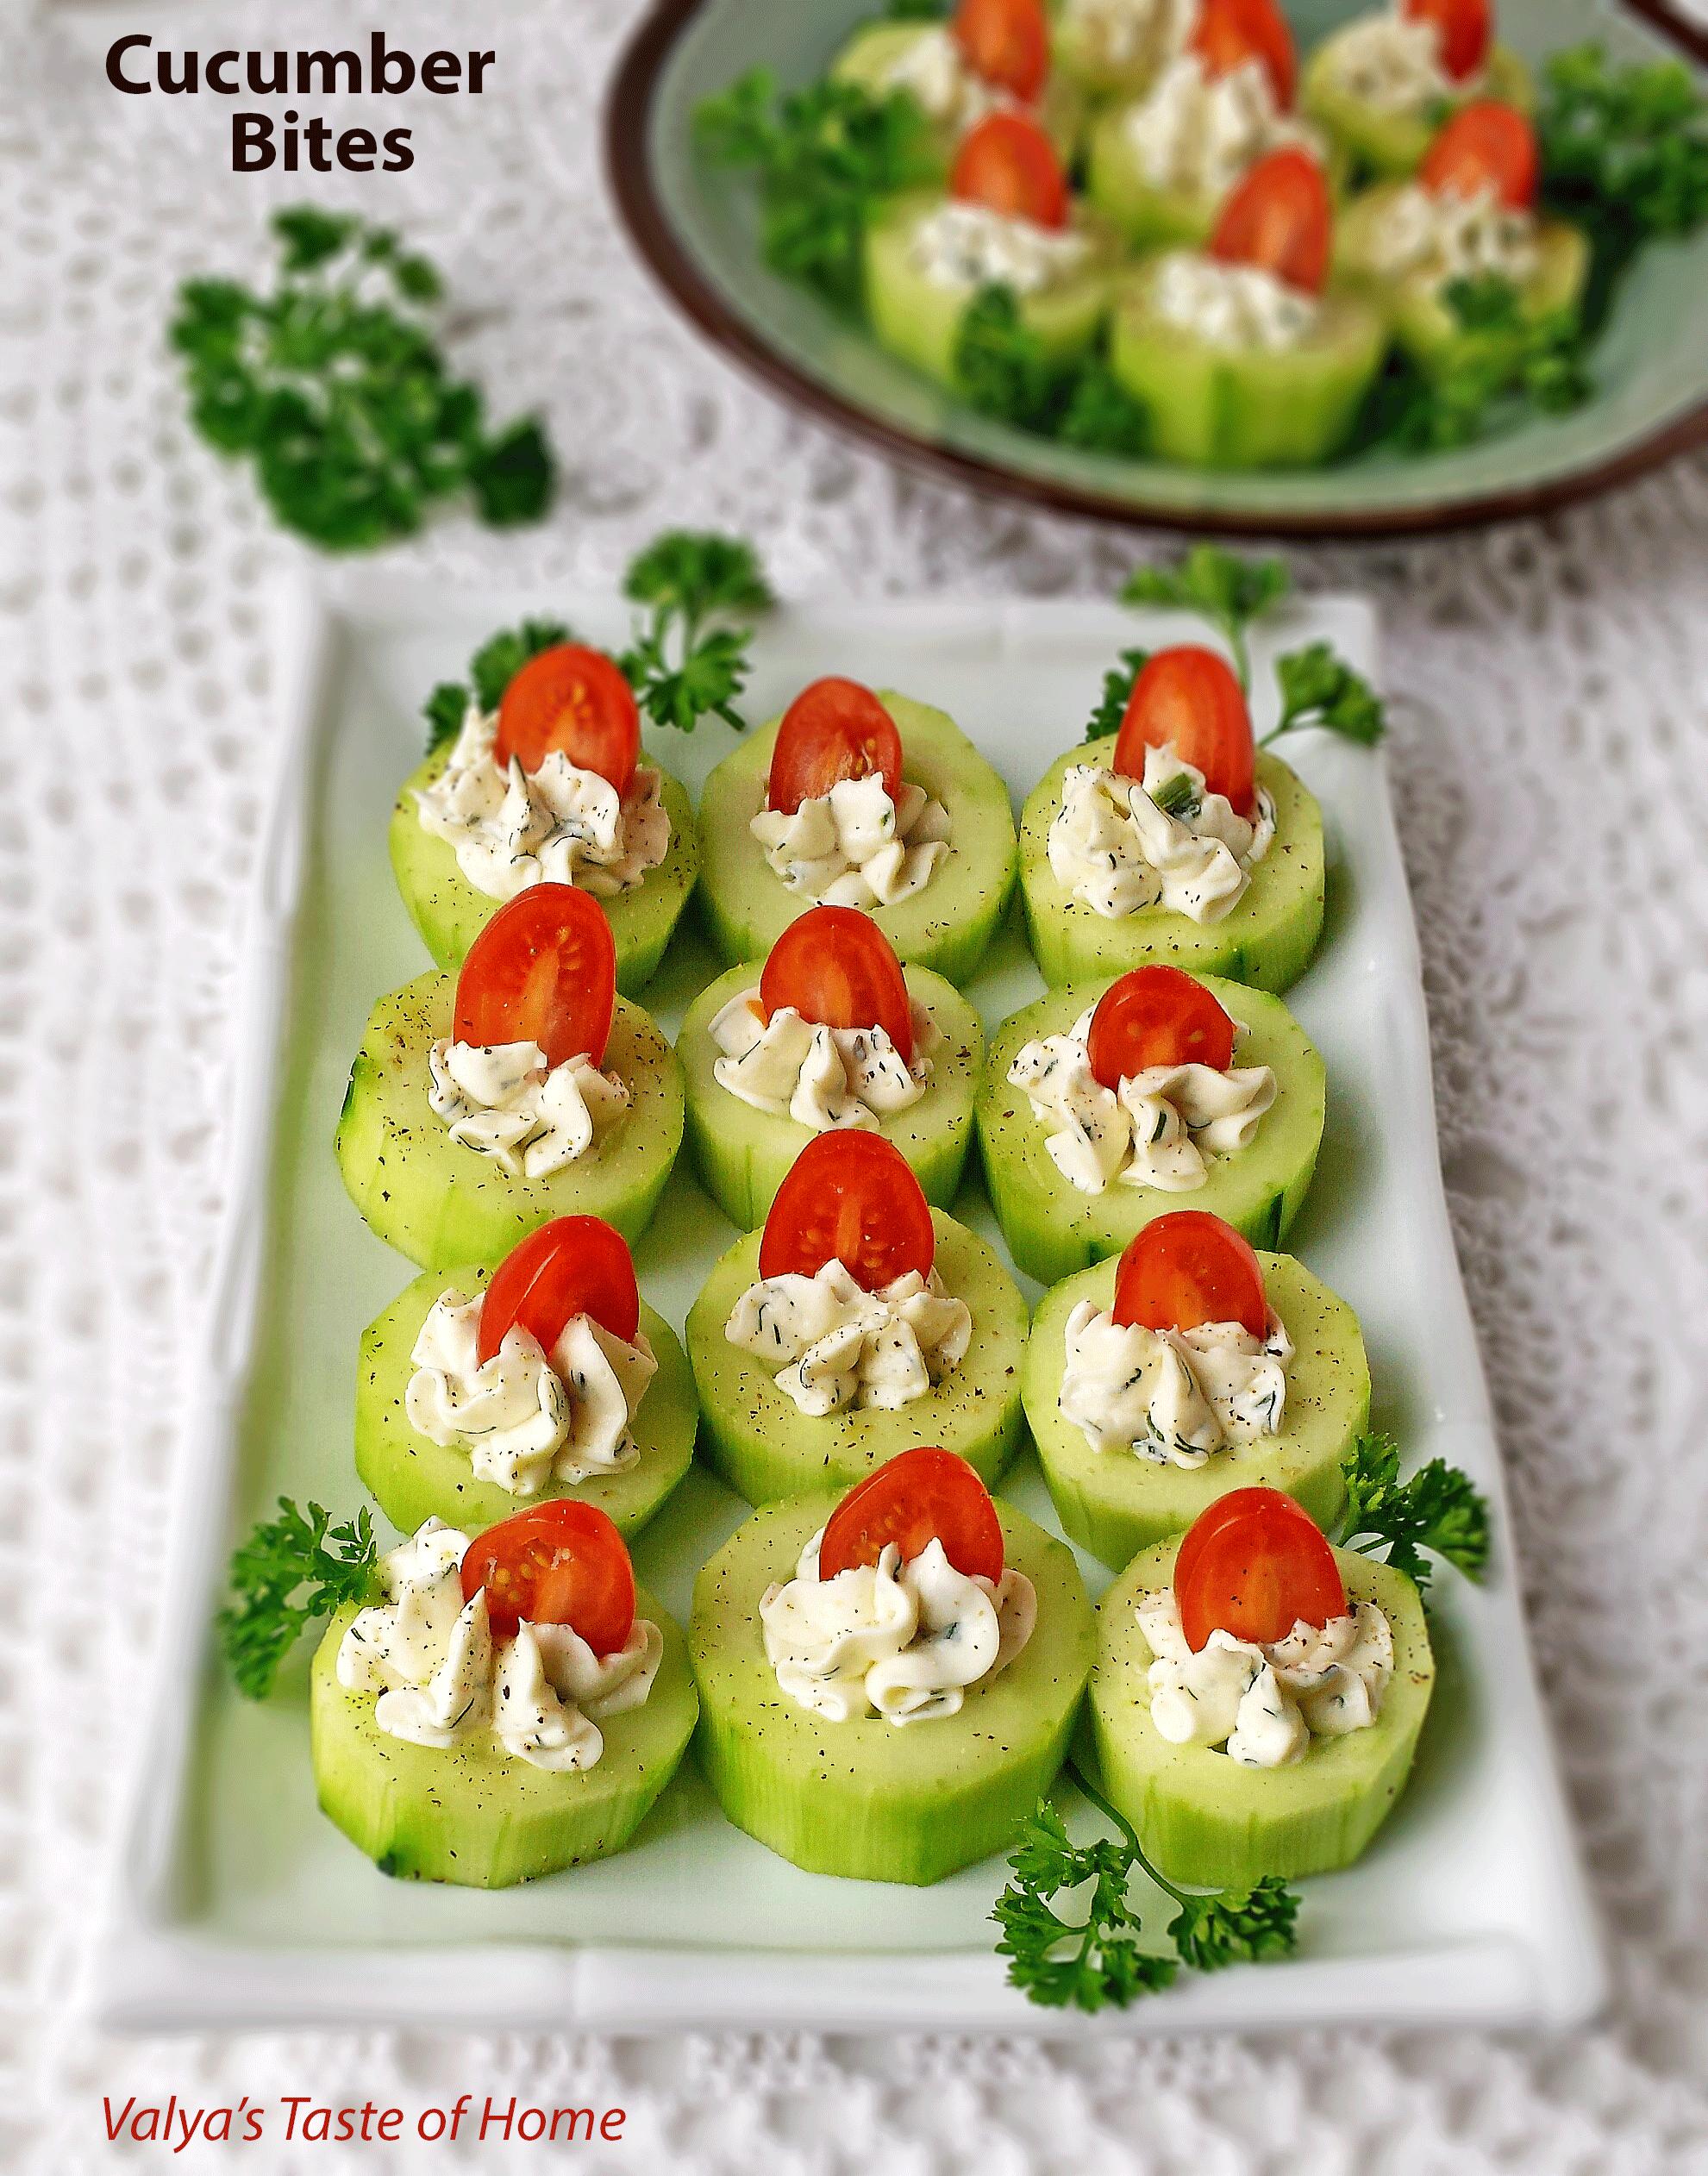 Cucumber Bites Appetizers Valya S Taste Of Home